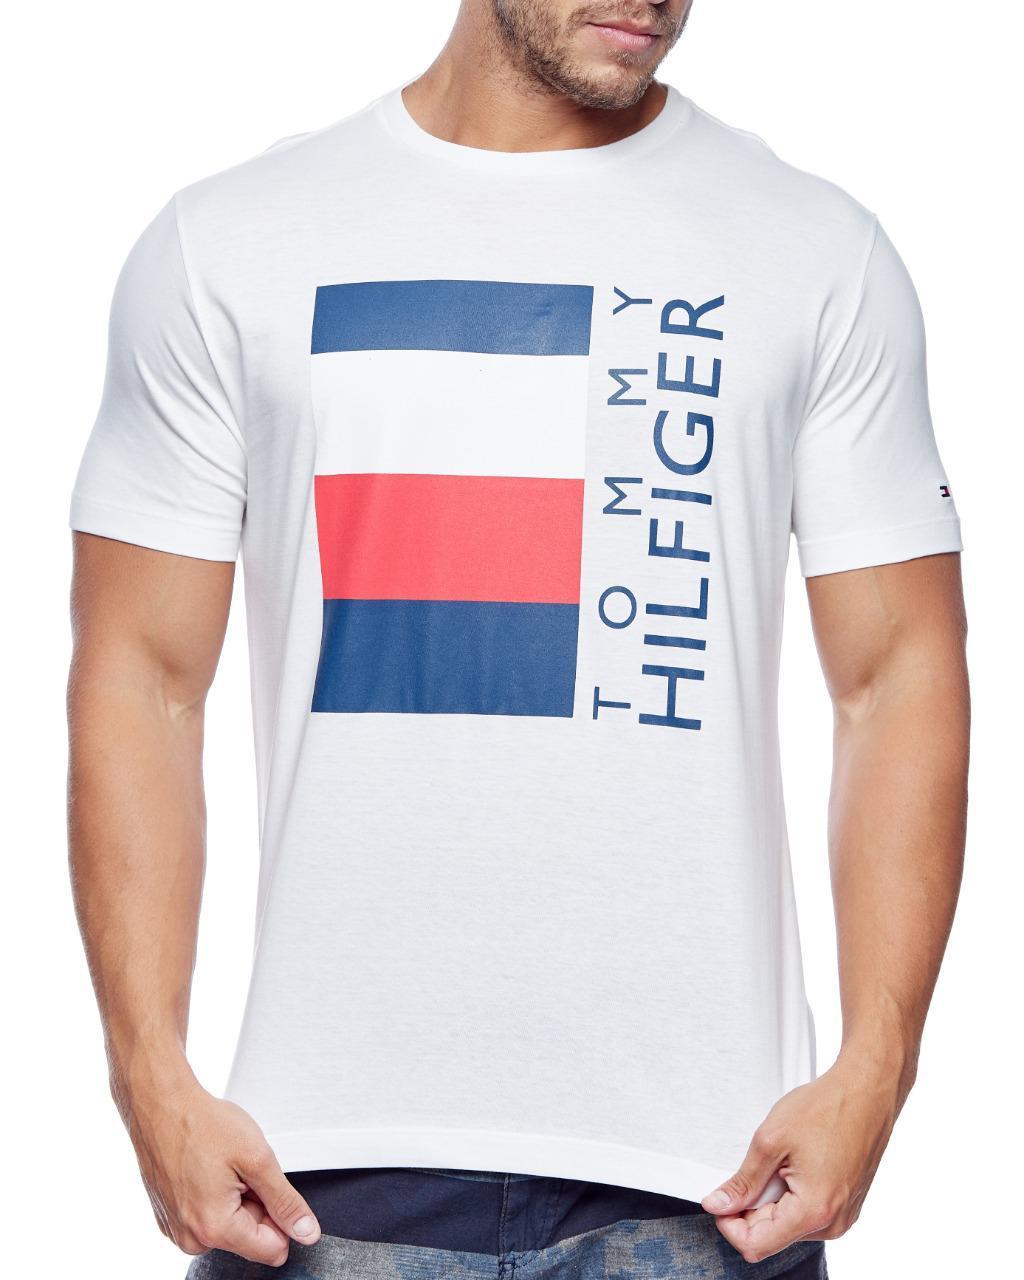 Camiseta Tommy Hilfiger Masculina Flag Lettering TH Branco